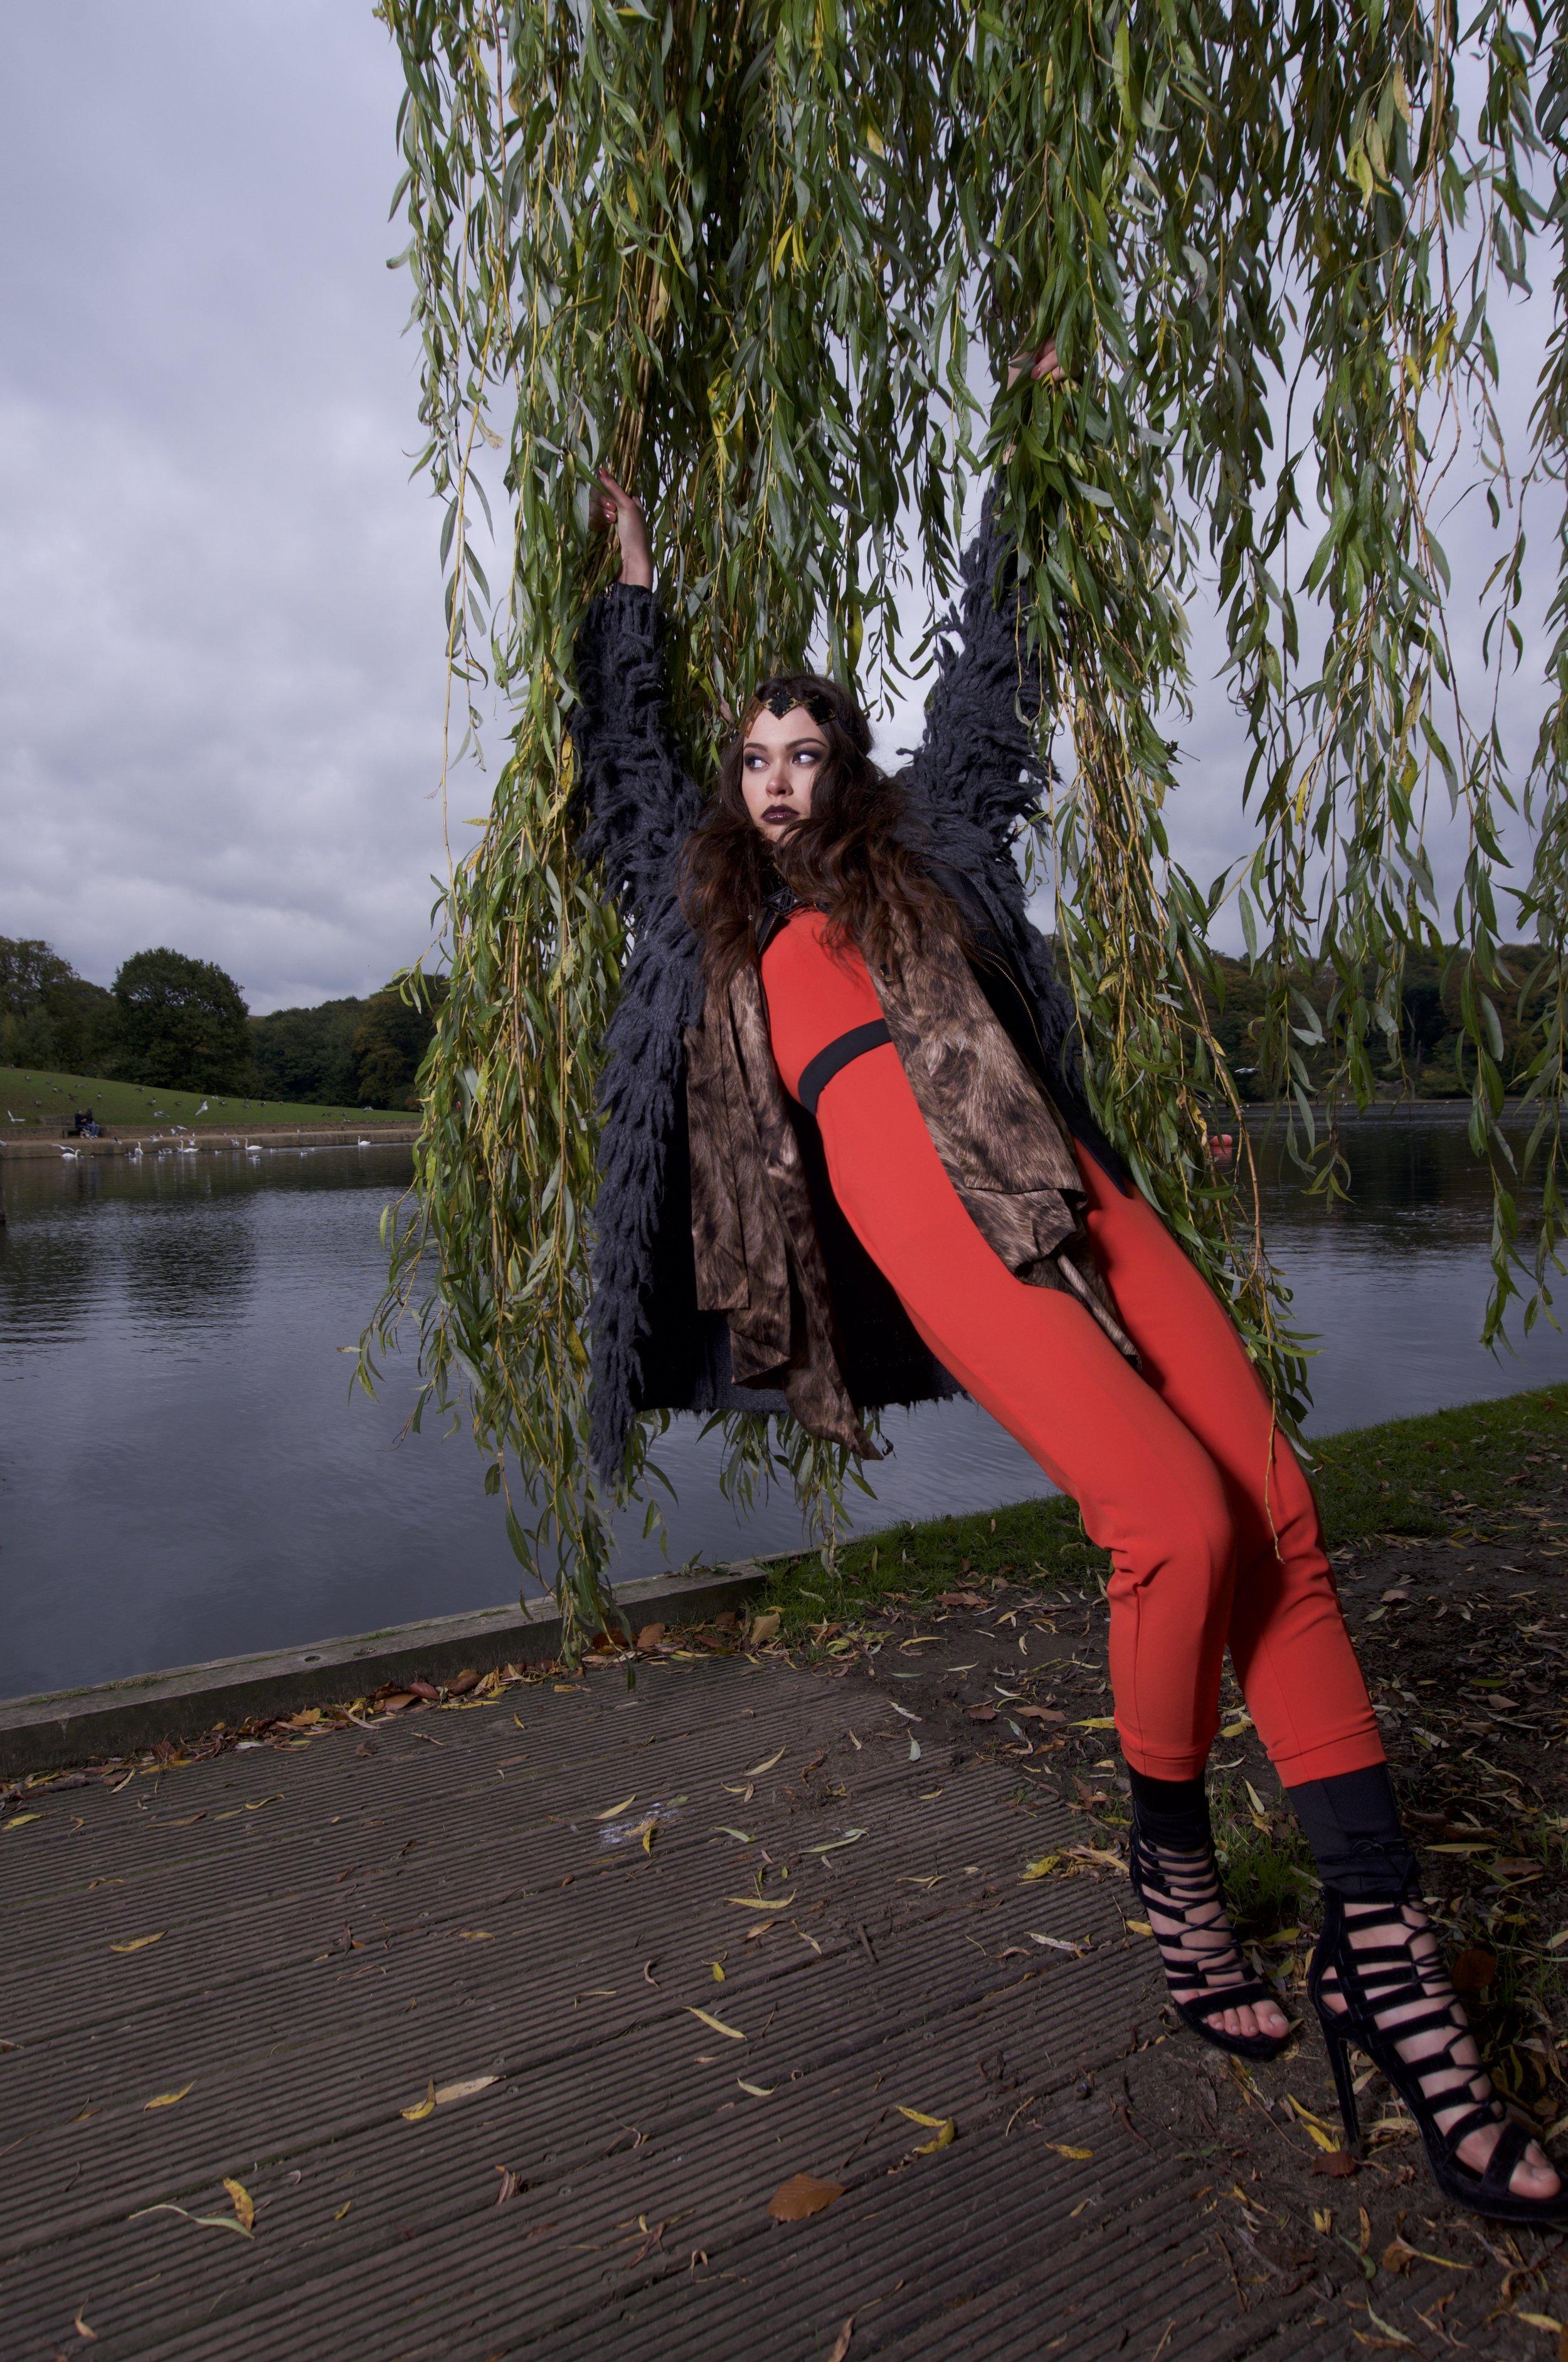 zaramia-ava-zaramiaava-leeds-fashion-designer-ethical-sustainable-tailored-minimalist-jacket-accent-coat-jacket-print-shirt-top-versatile-drape-cowl-styling-shop-womenswear-models-photoshoot-colour-13